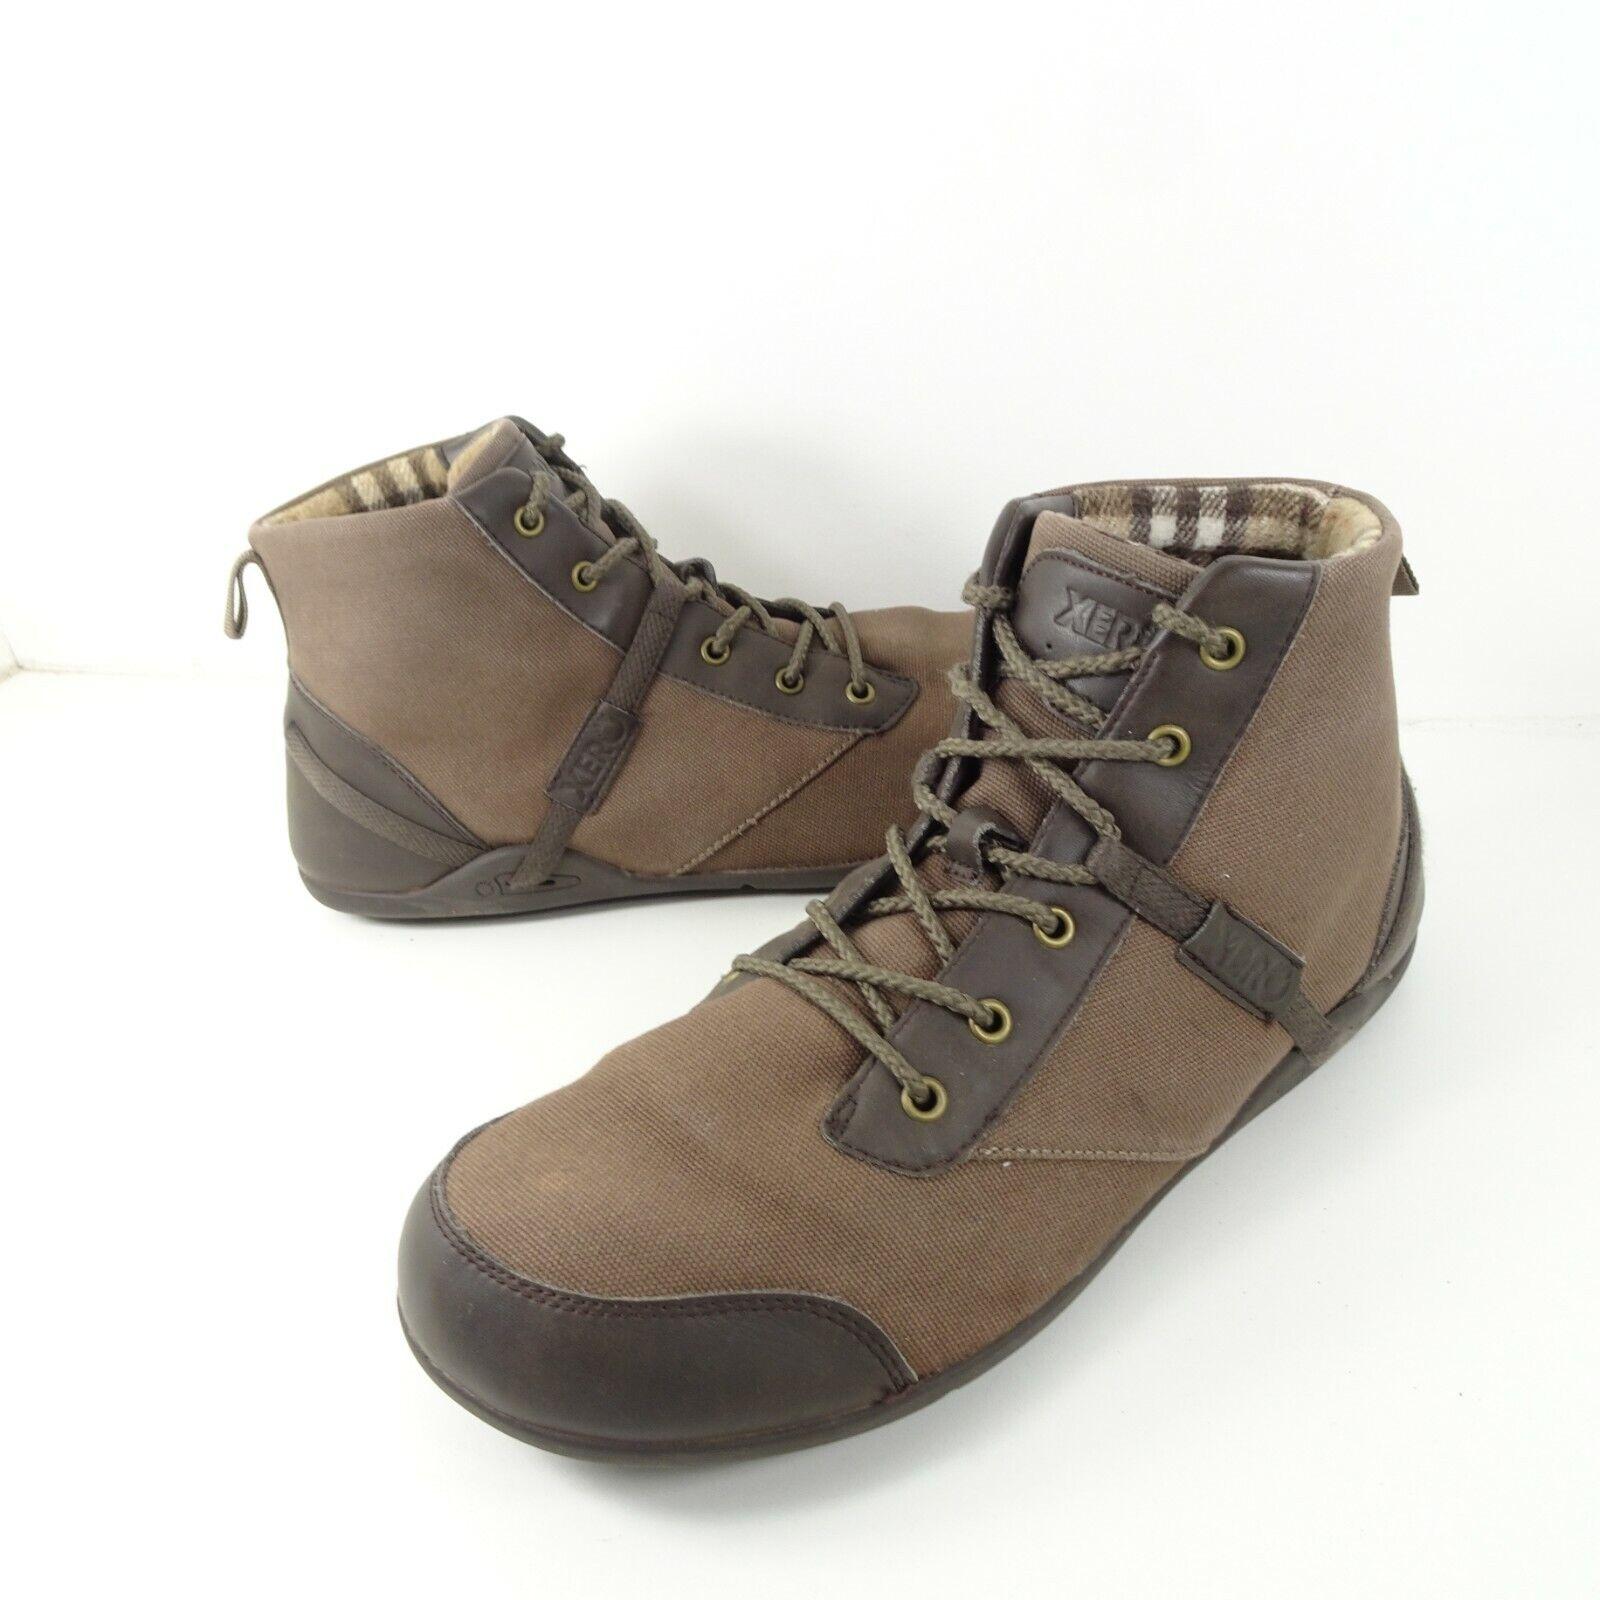 Xero Shoes Brown Minimalist Barefoot Denver Boots Lightweight Mens Size 13